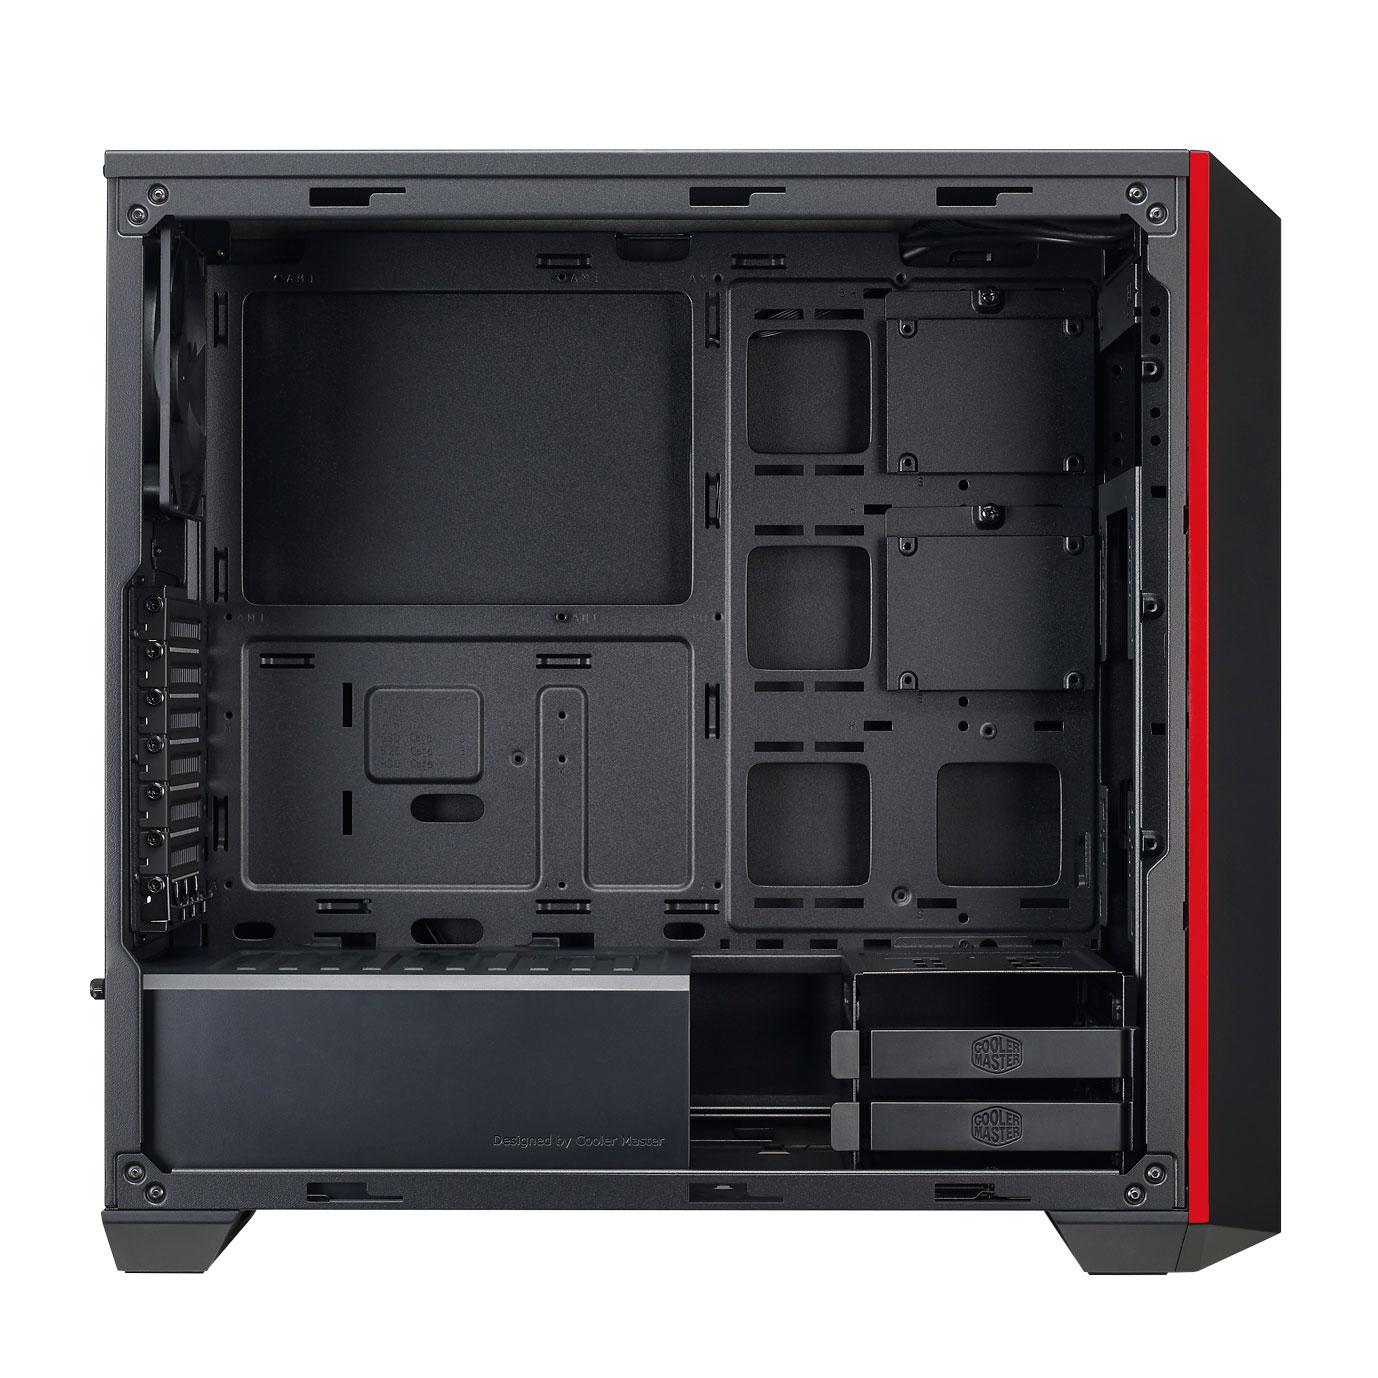 Cooler Master MasterBox 5 MSI MCX-B5S2-KWNN-03-MI Rouge - Boîtier PC - 2